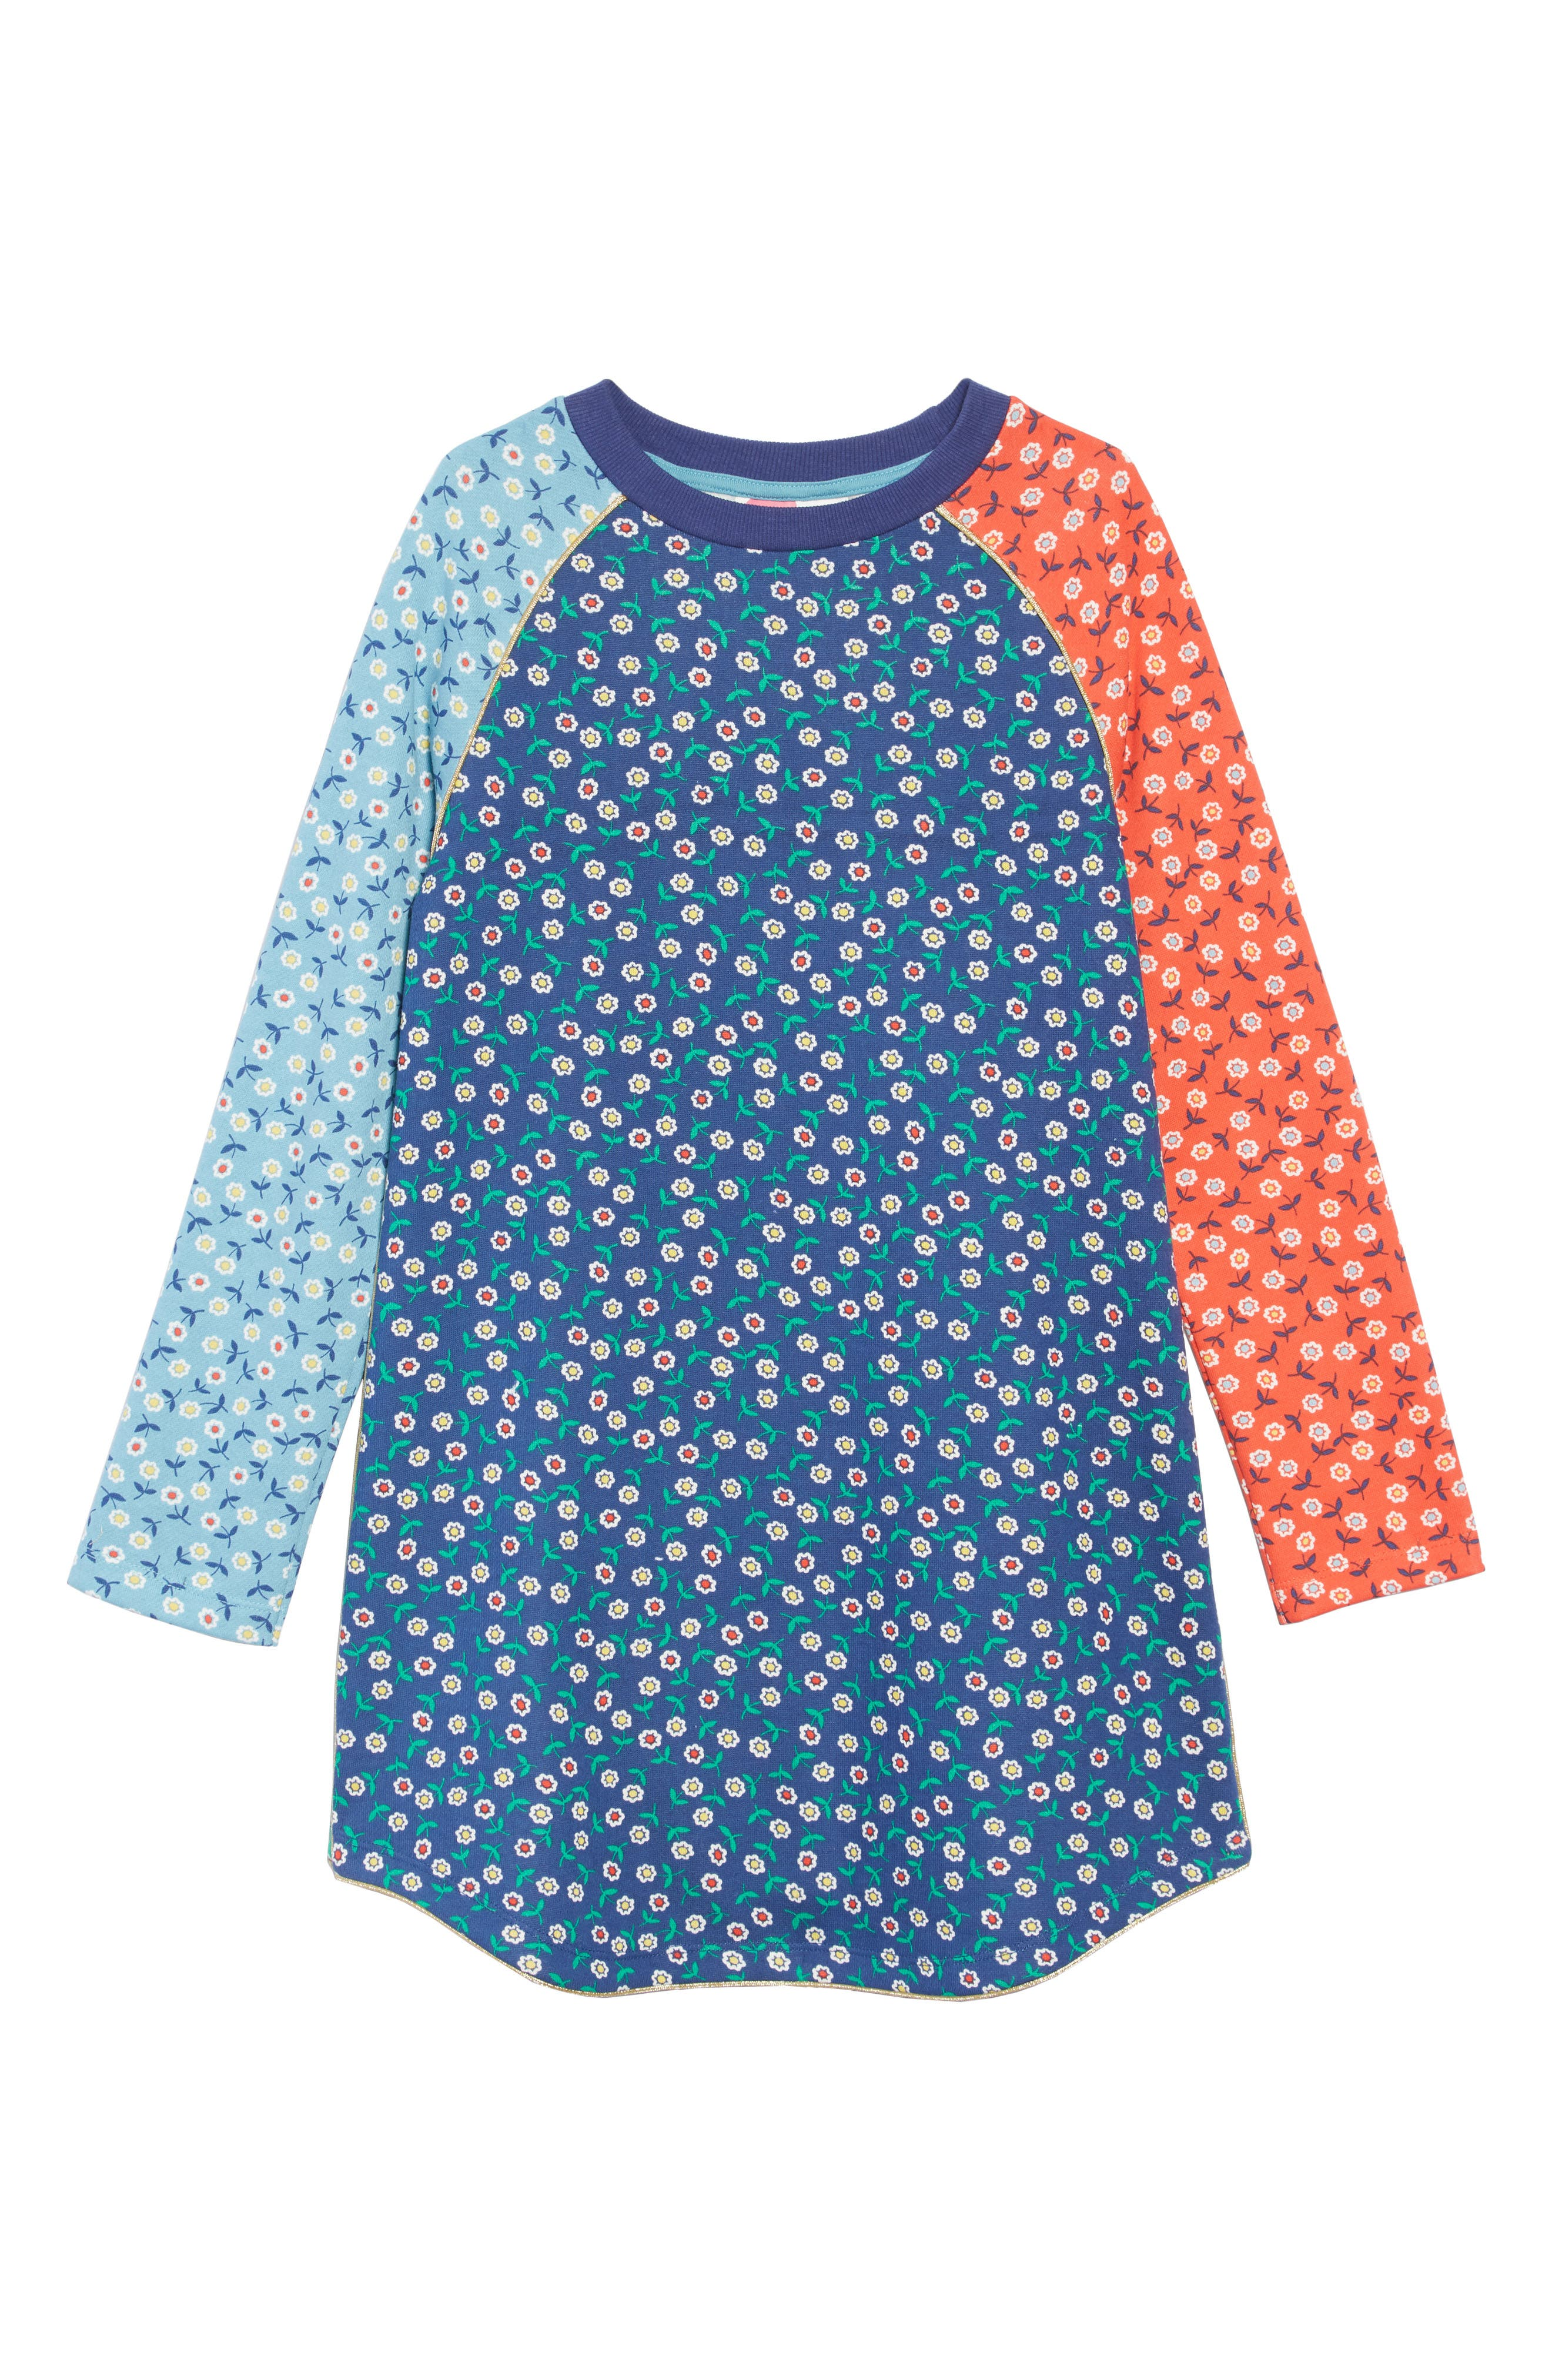 Cozy Sweatshirt Dress,                             Main thumbnail 1, color,                             900